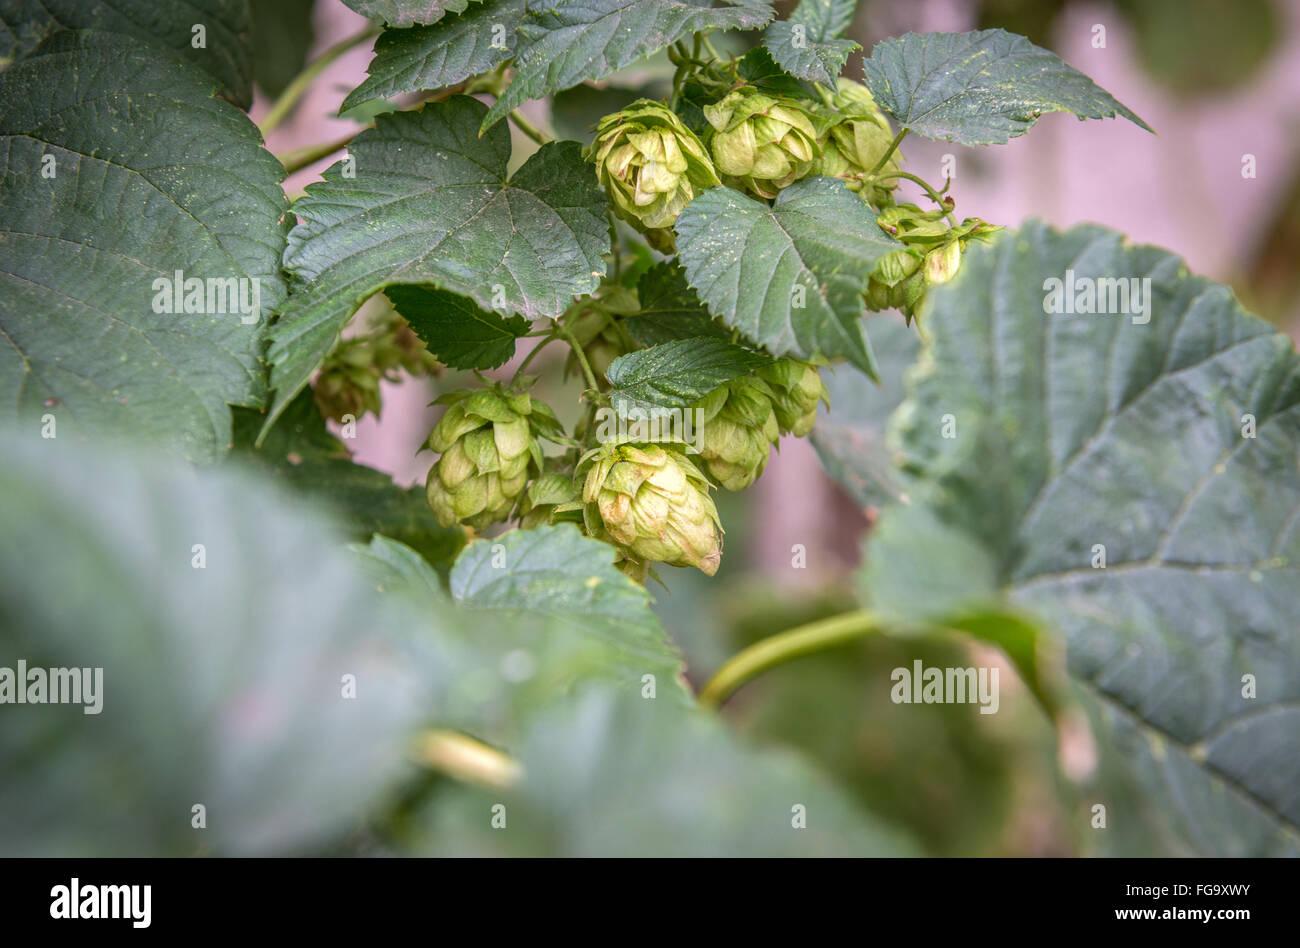 green hop plant in Pilsen city in Czech Republic - Stock Image